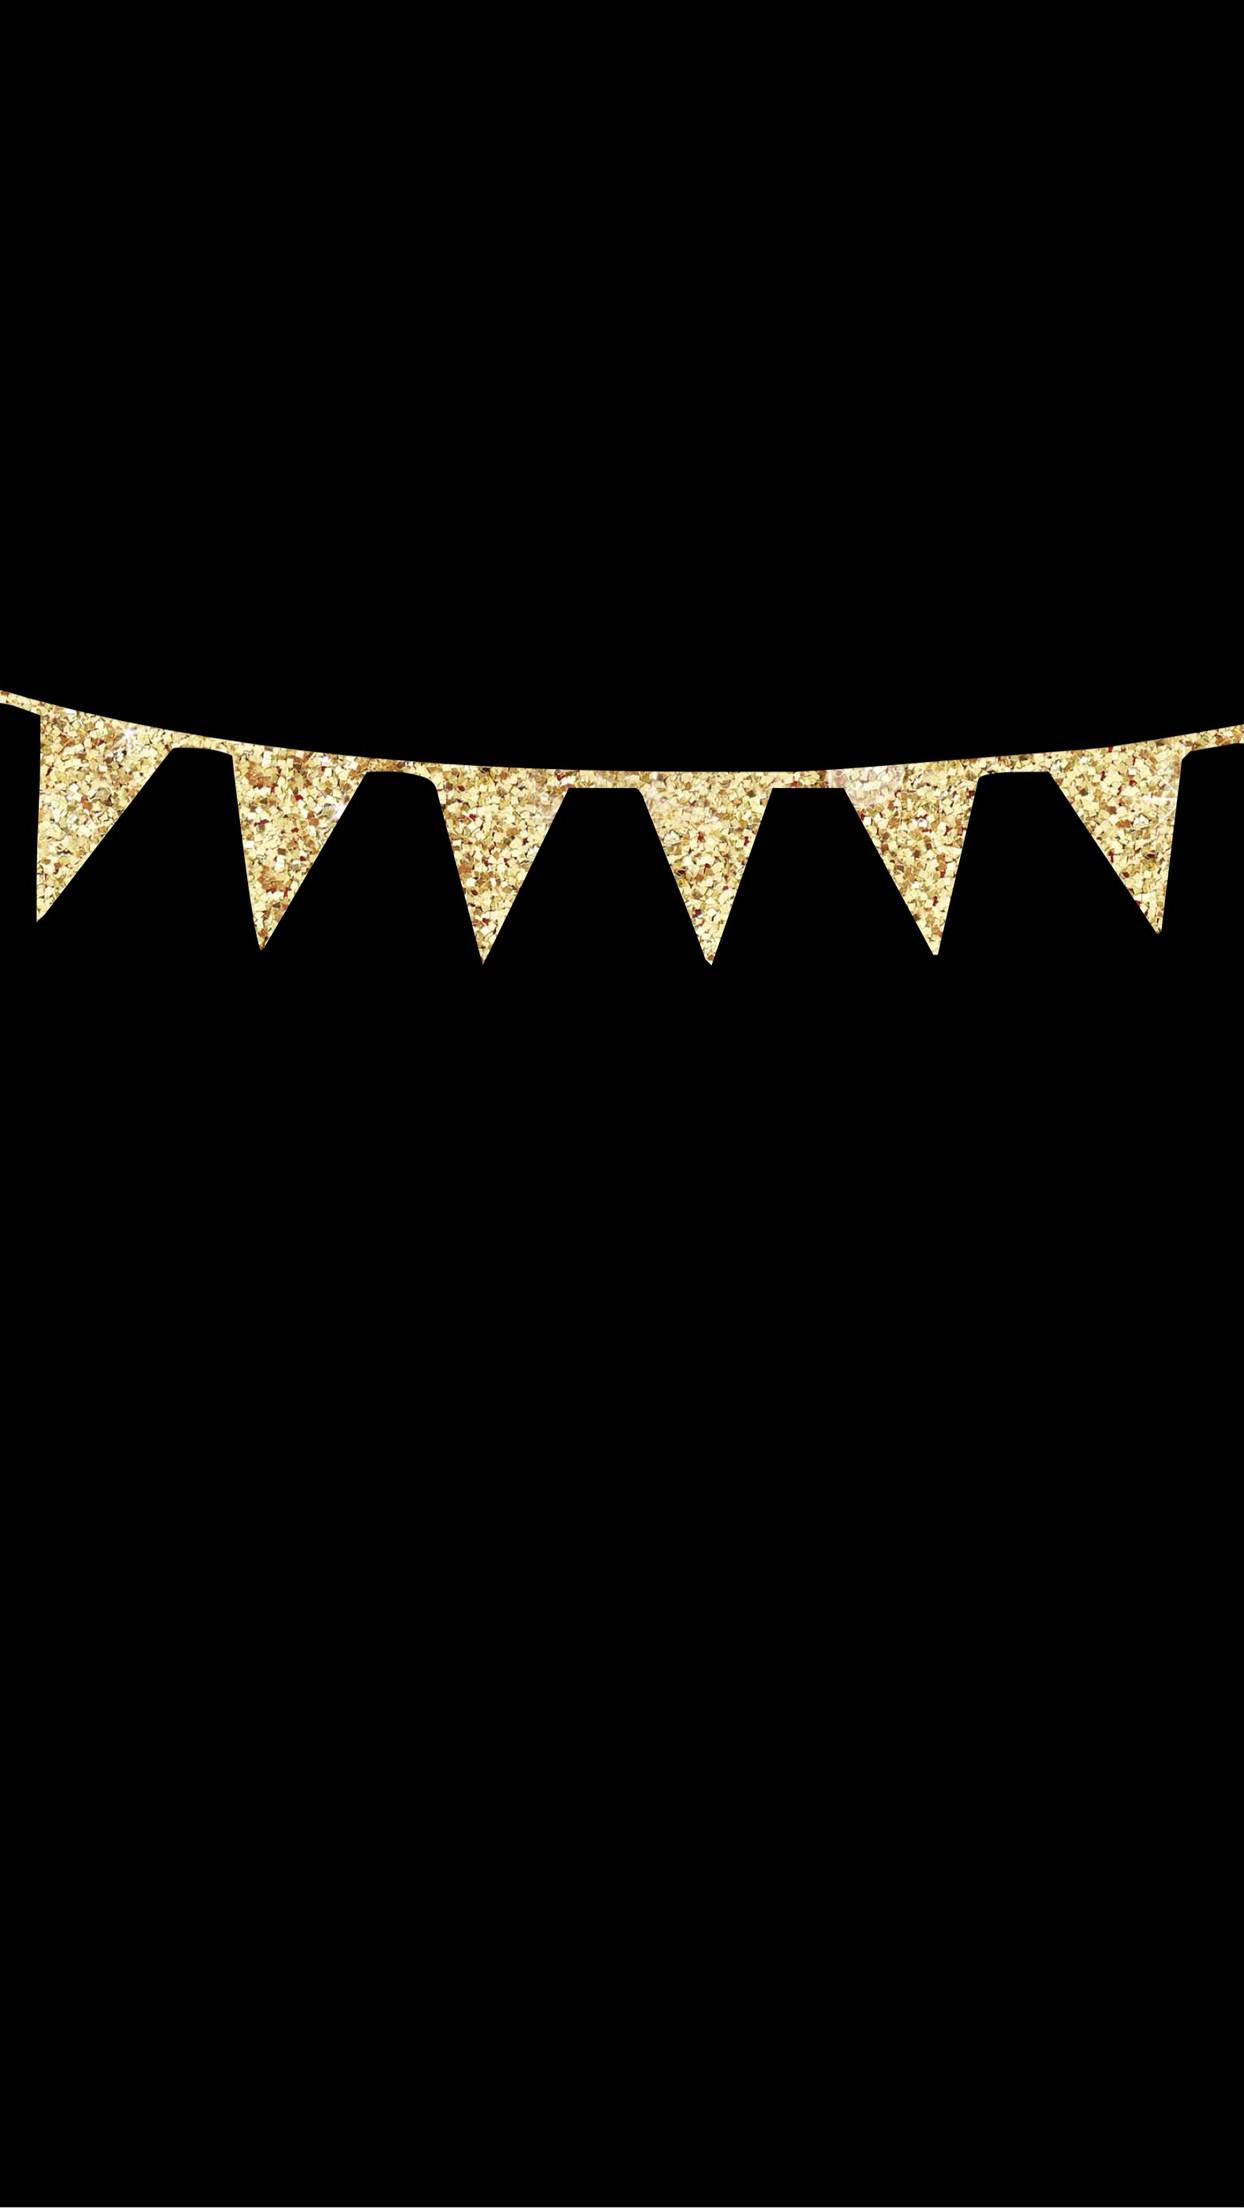 1244x2208 IPhone 6 Plus Lock Screen Wallpaper Black With Gold Glitter